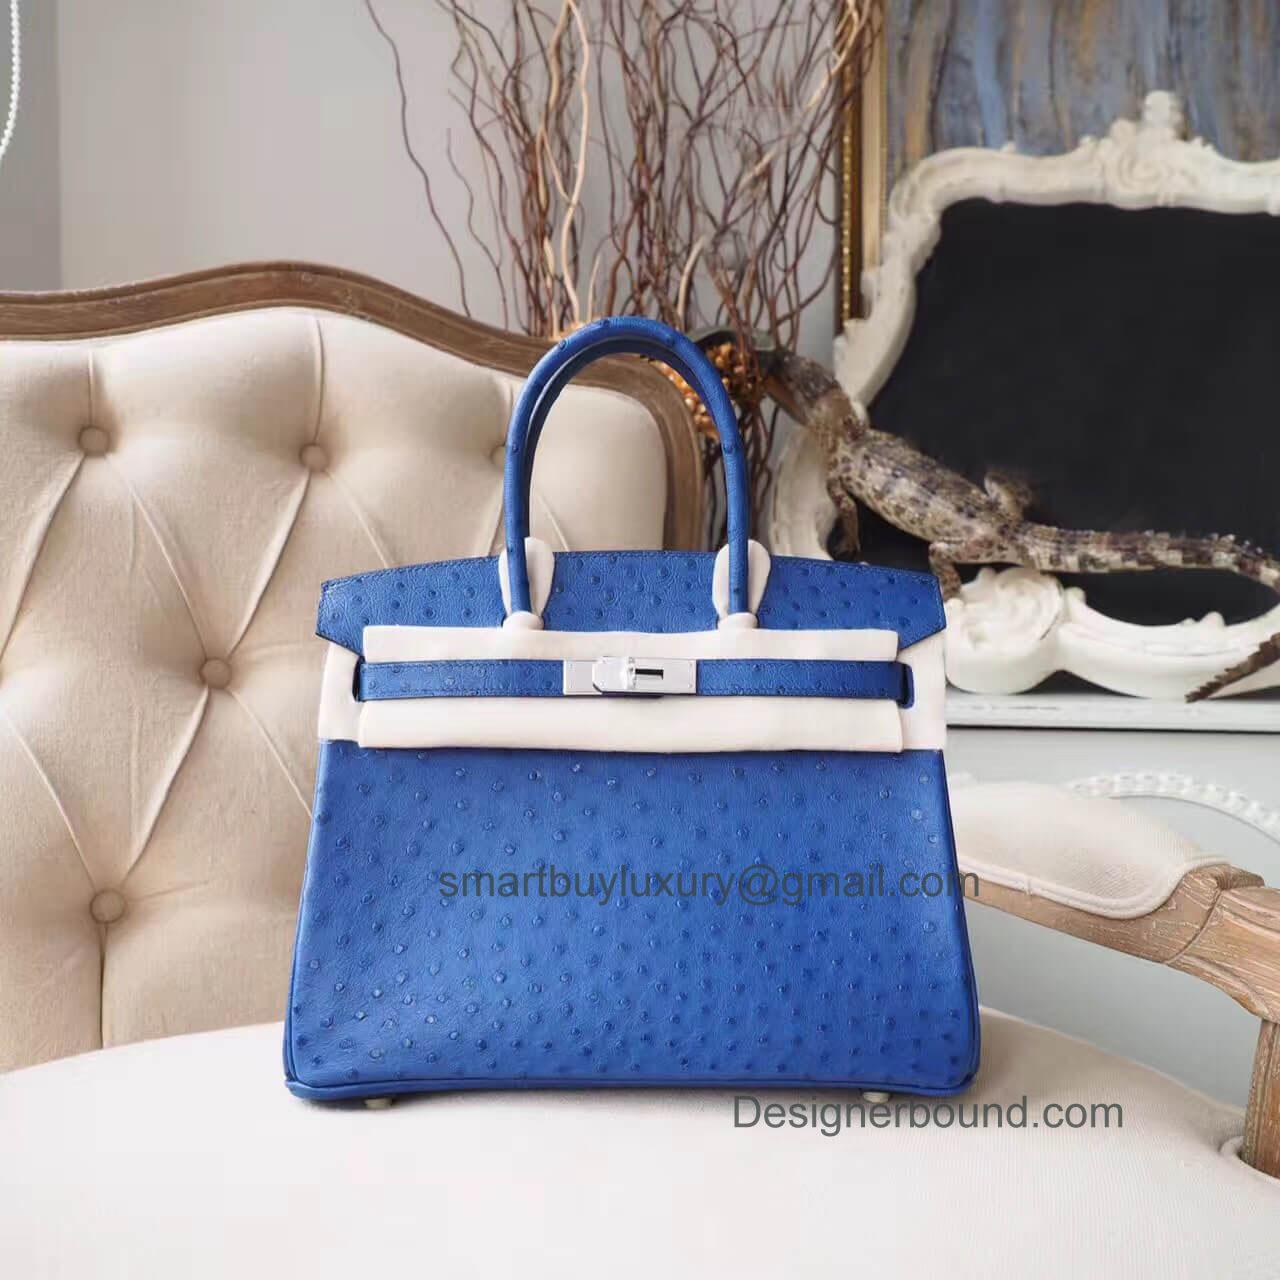 0045623c18 Hermes Birkin 30 Handbag in ck77 Blue Iris Ostrich PHW - Hermes Replica